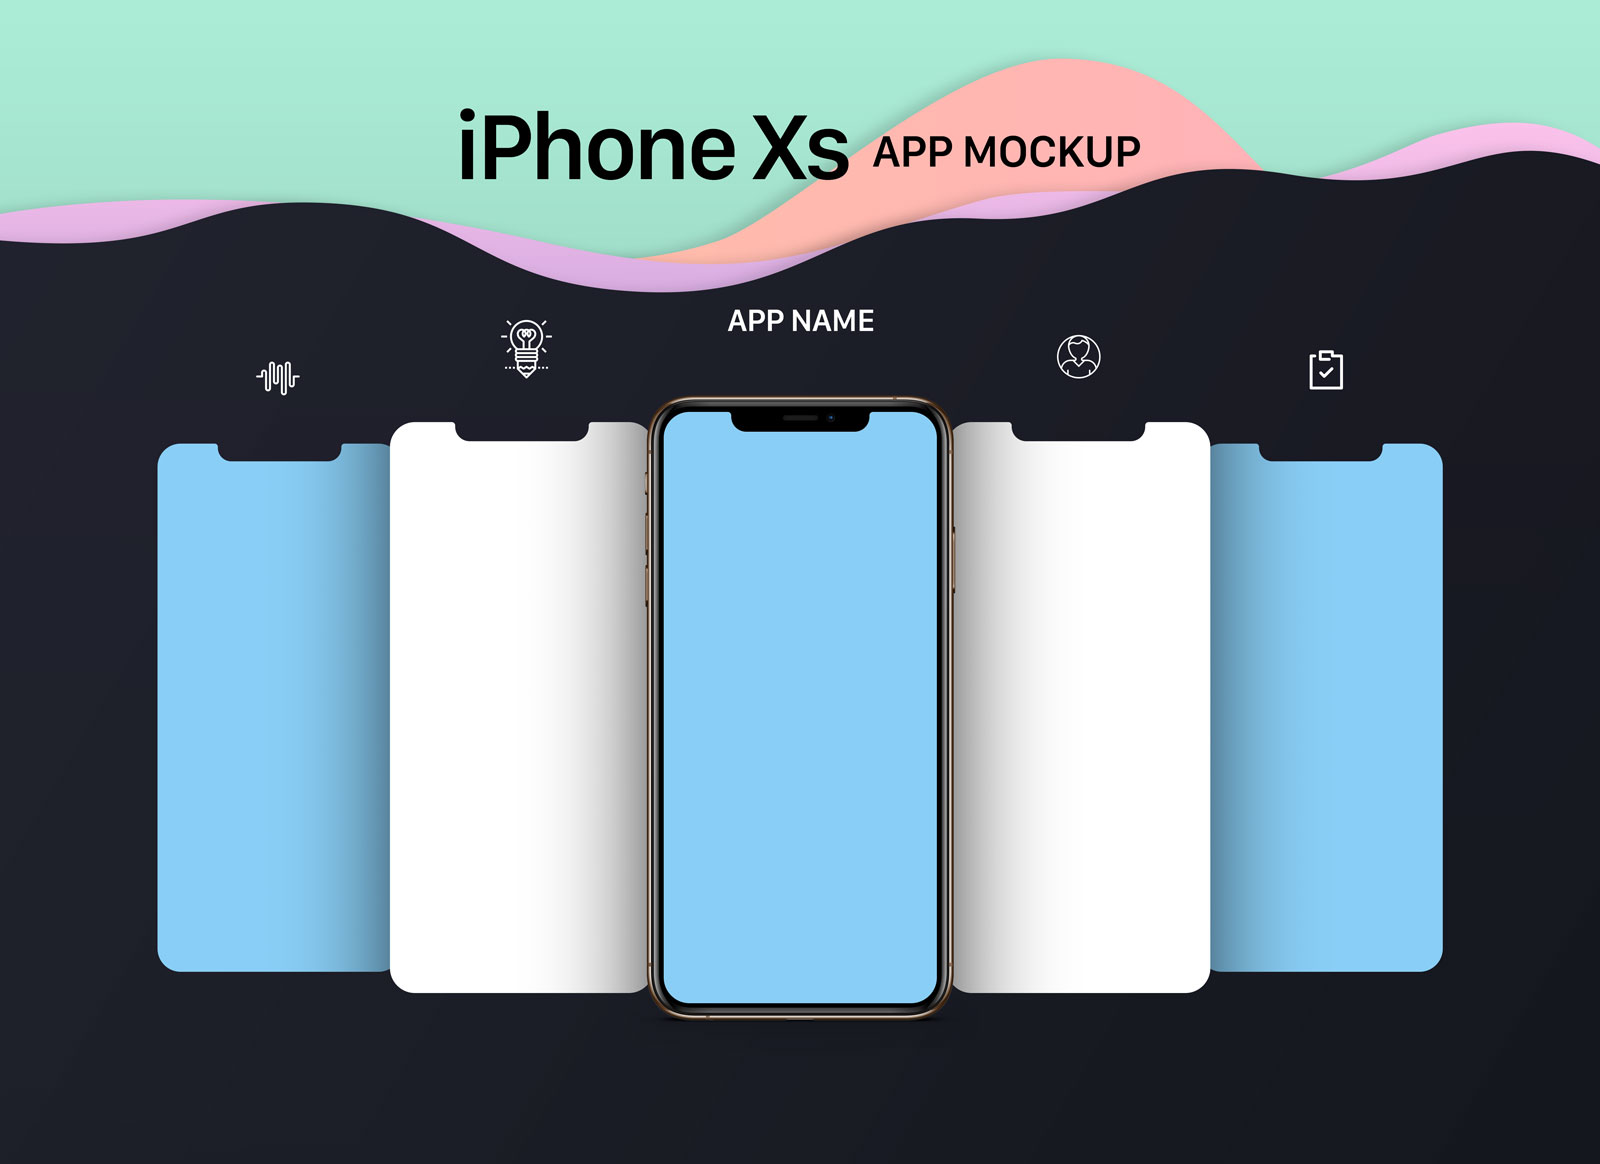 Free-iPhone-XS-App-Mockup-PSD-File